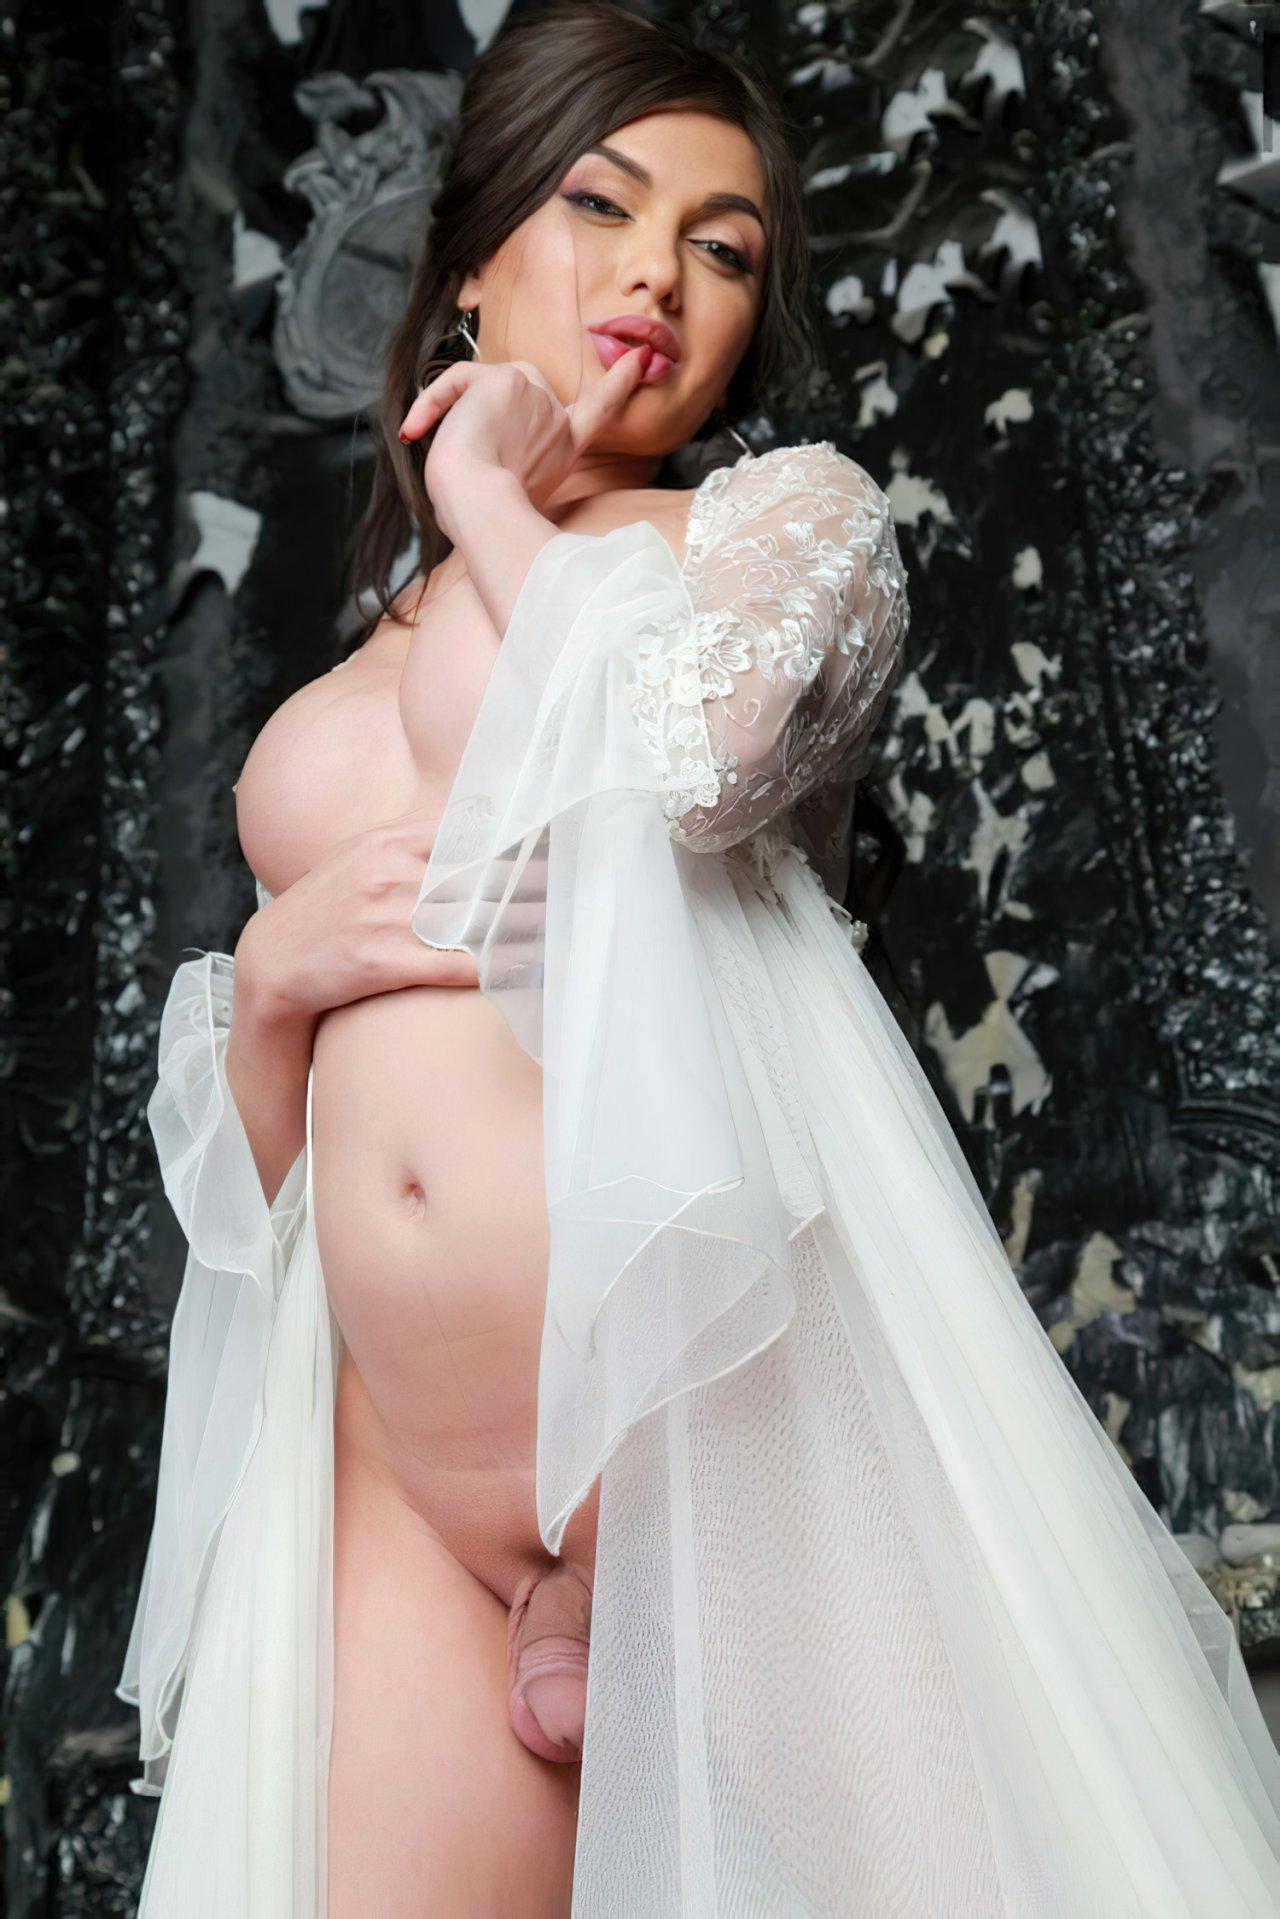 Travestis Gostosas (59)